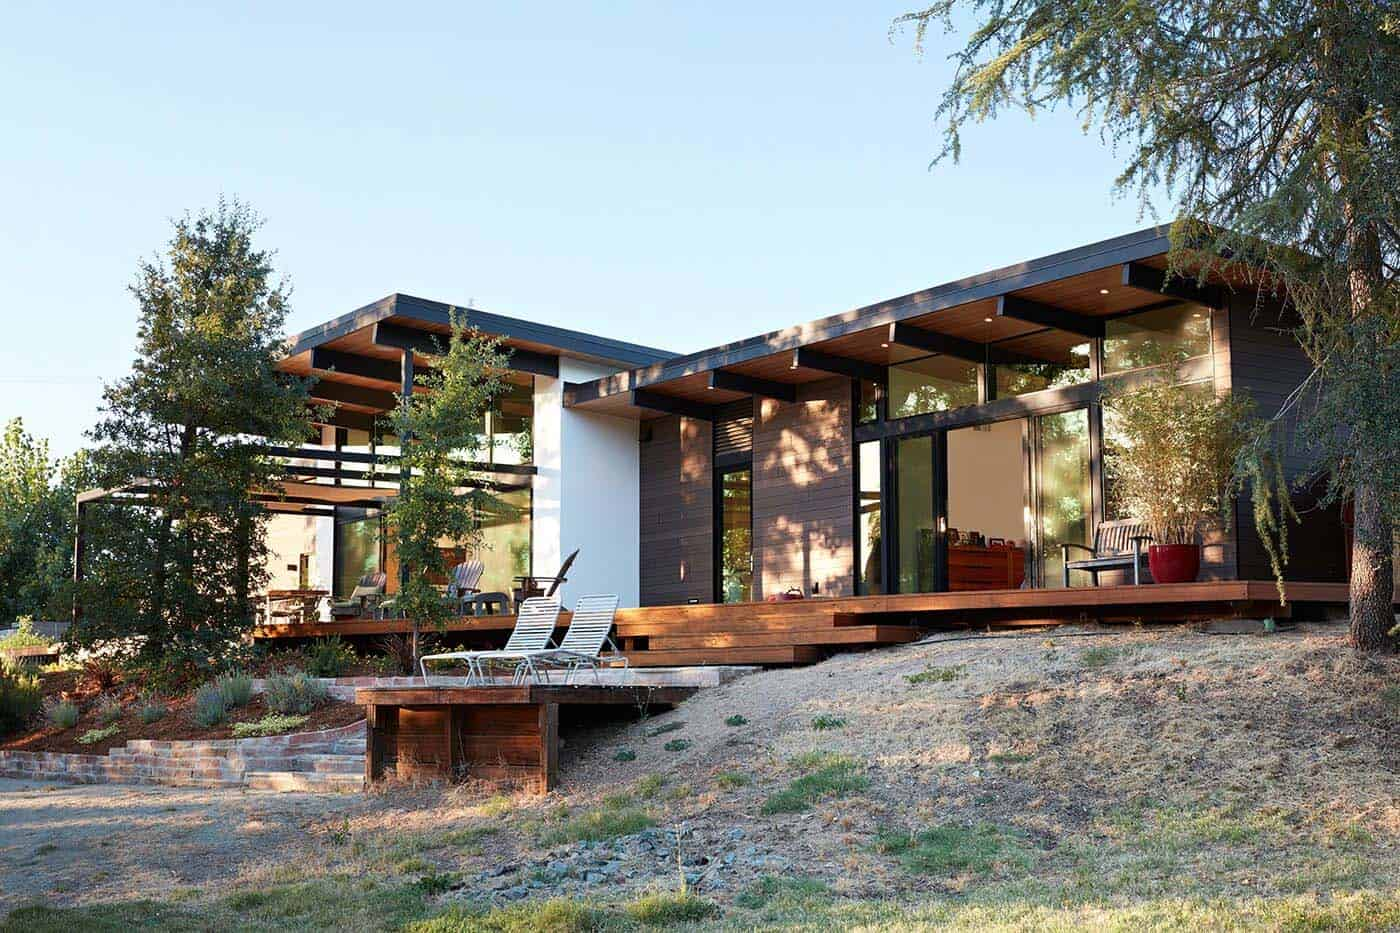 Sacramento Modern Residence-Klopf Architecture-16-1 Kindesign